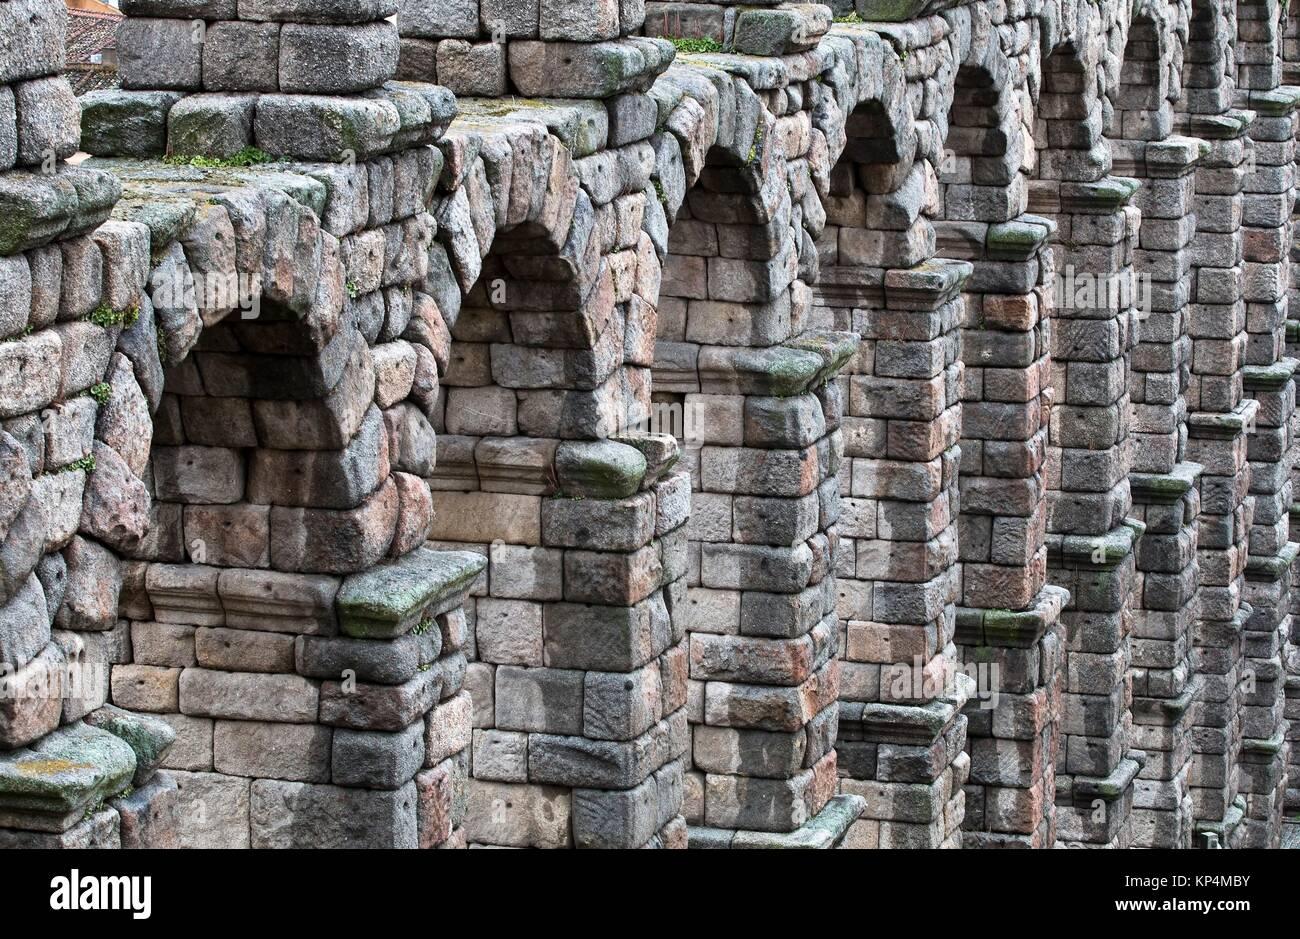 Acueducto romano de Segovia - Castilla-León - España - Europa. - Stock Image